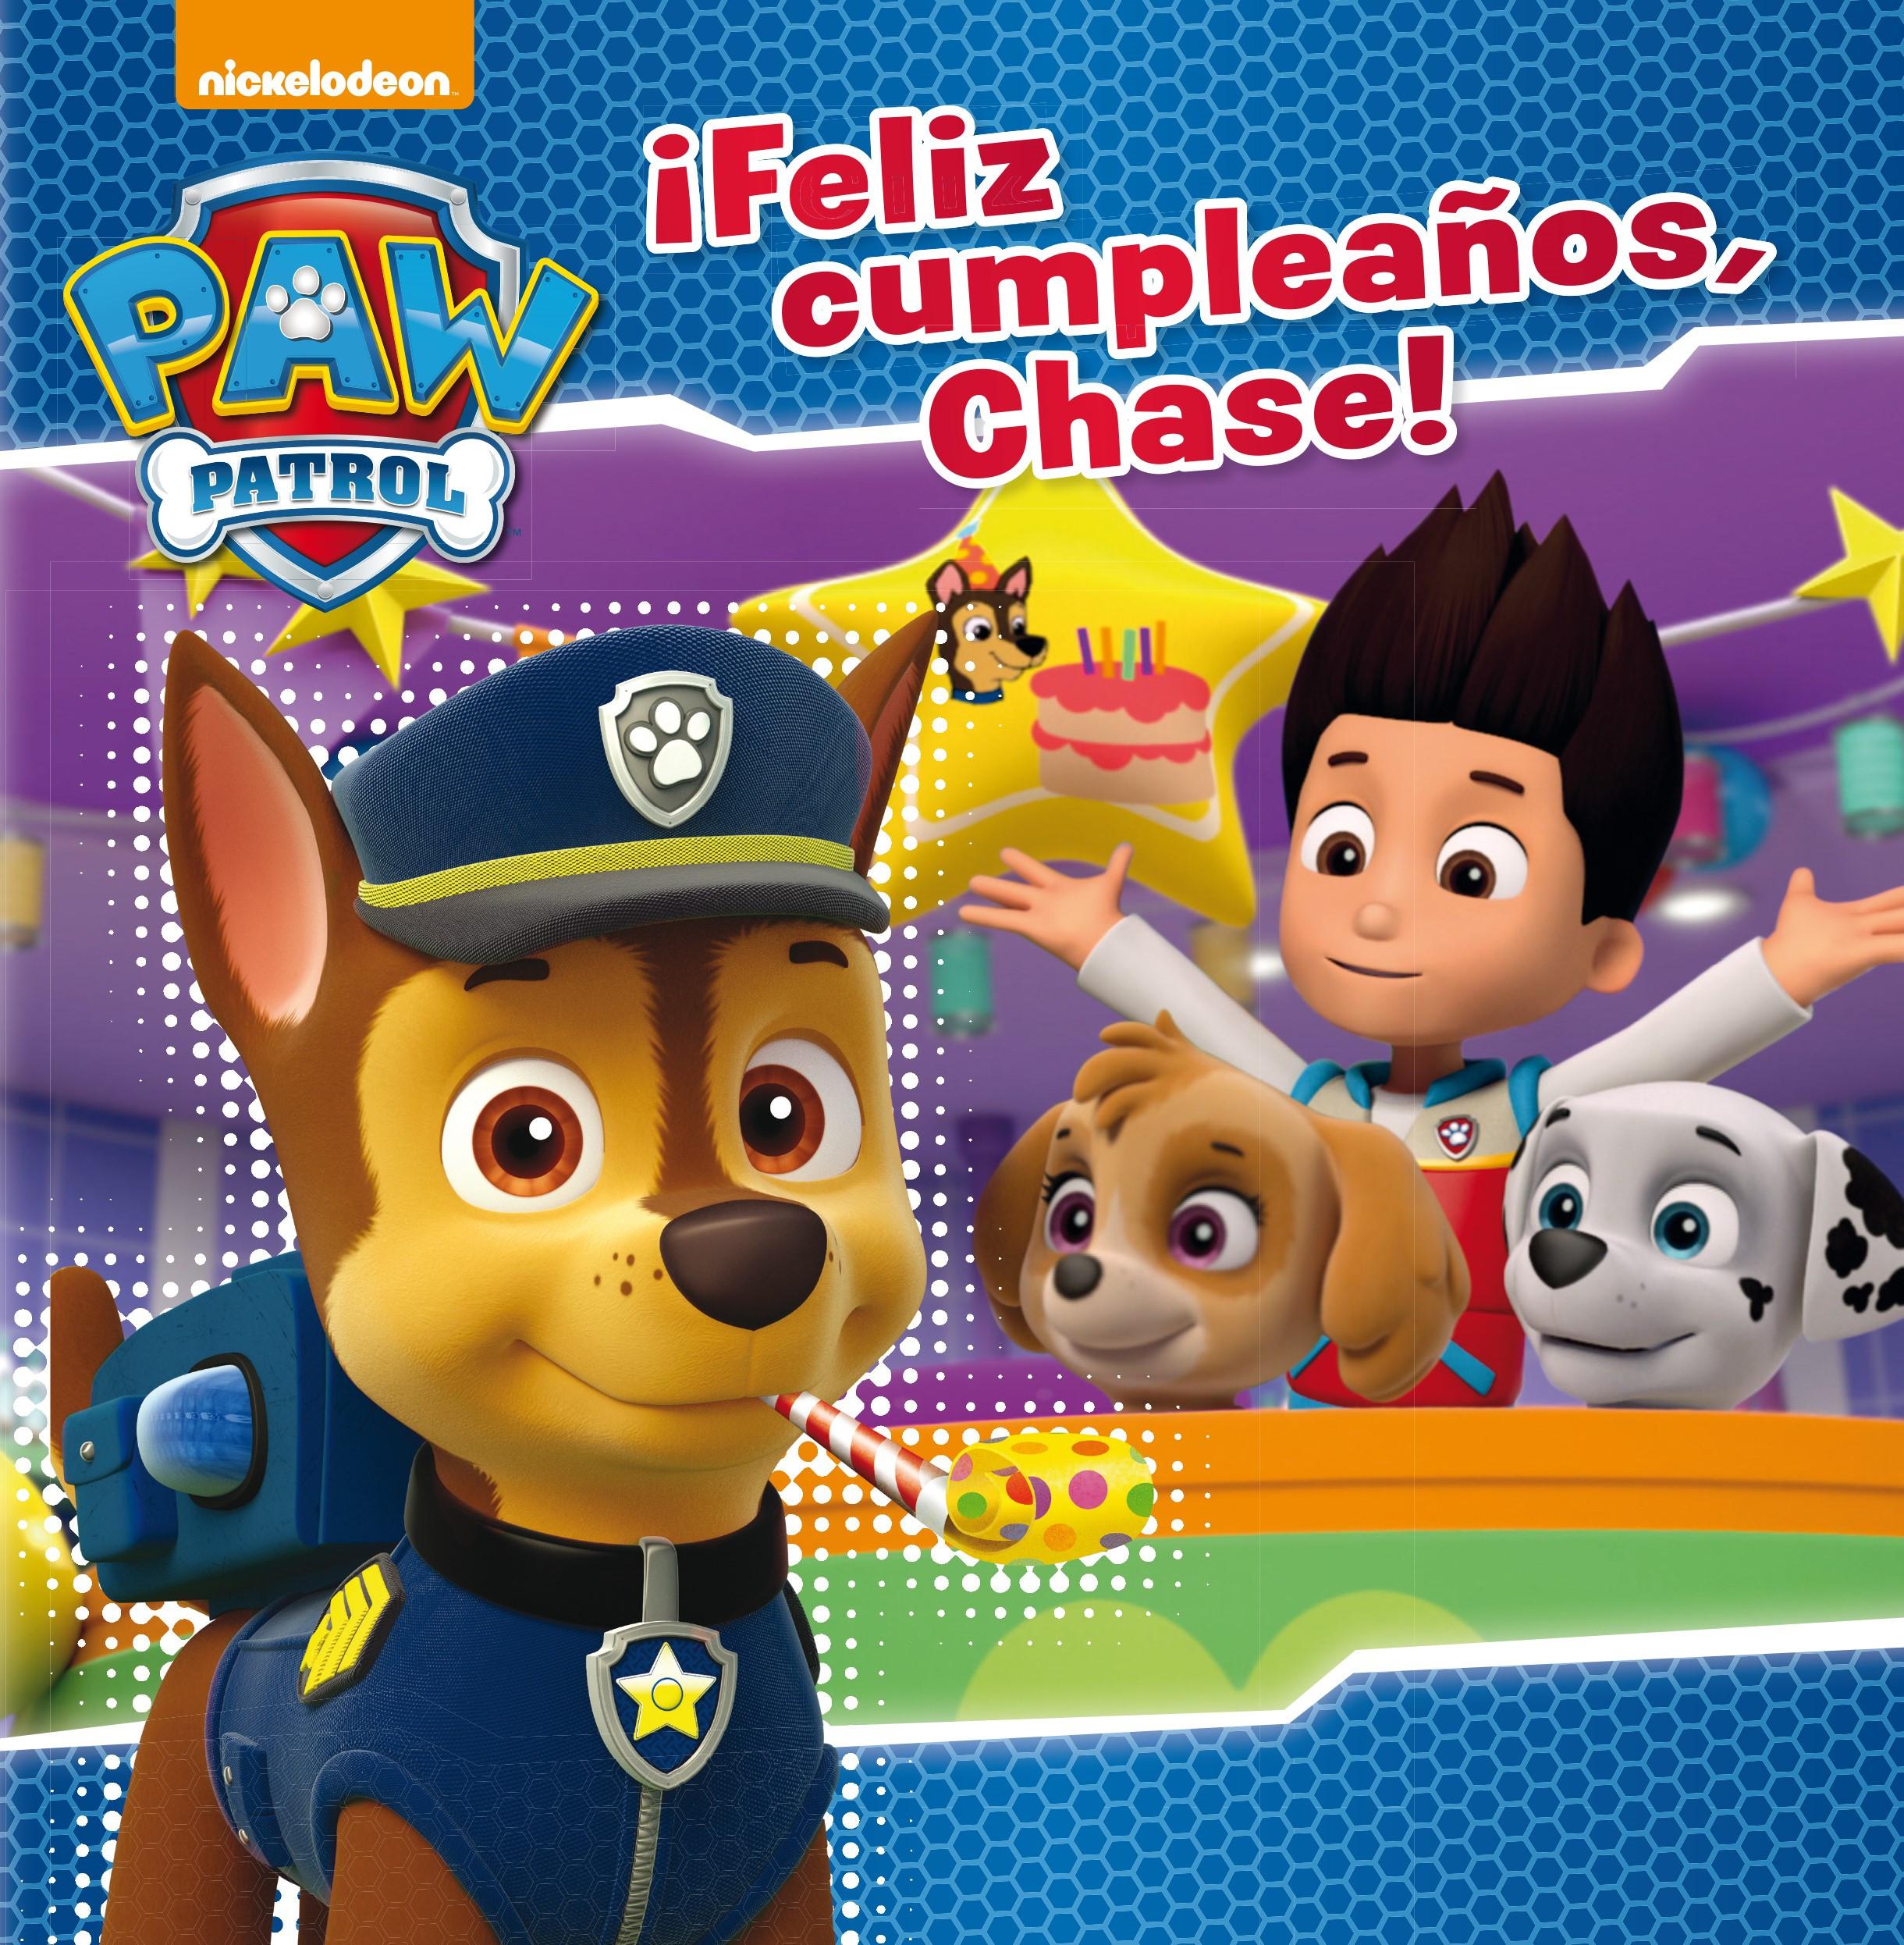 ¡Feliz cumpleaños, Chase! (Paw Patrol | Patrulla Canina)